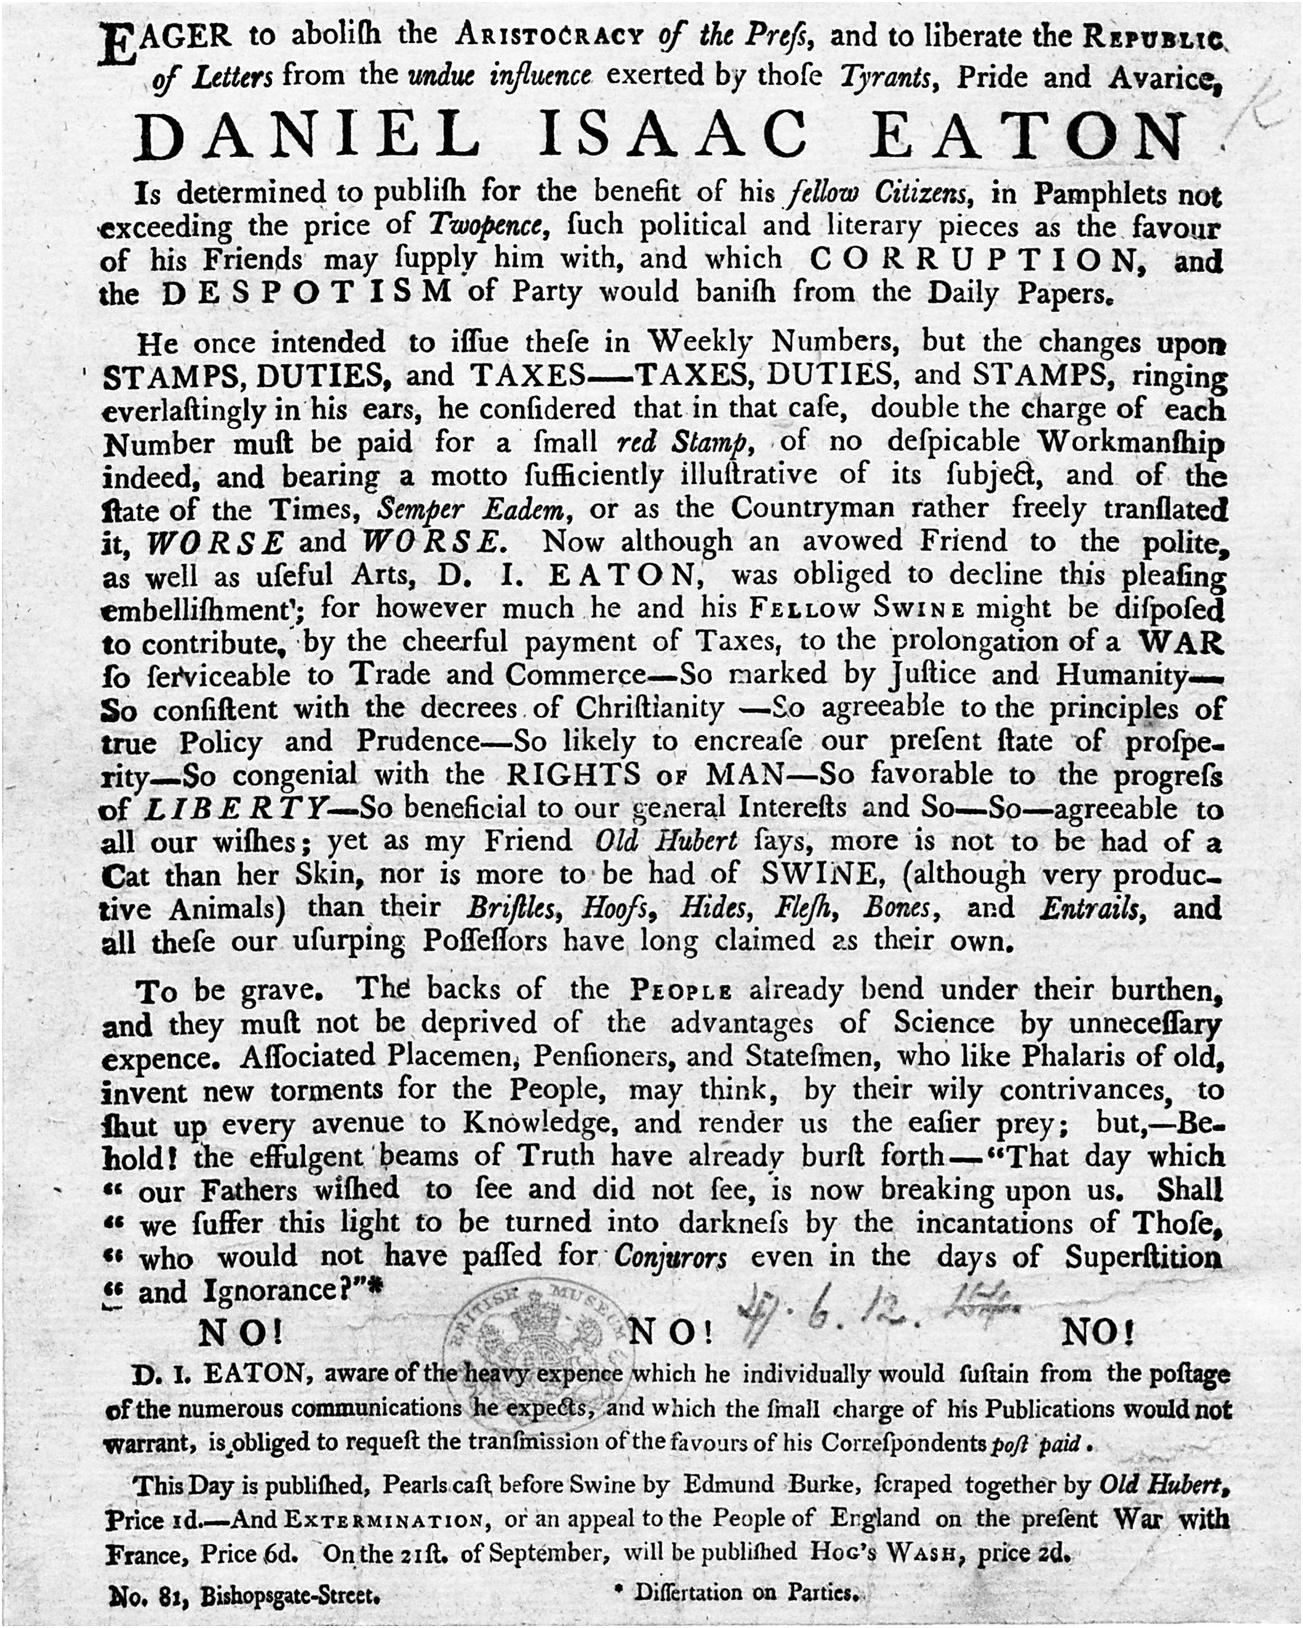 Publicity, print, and association (Part I) - Print